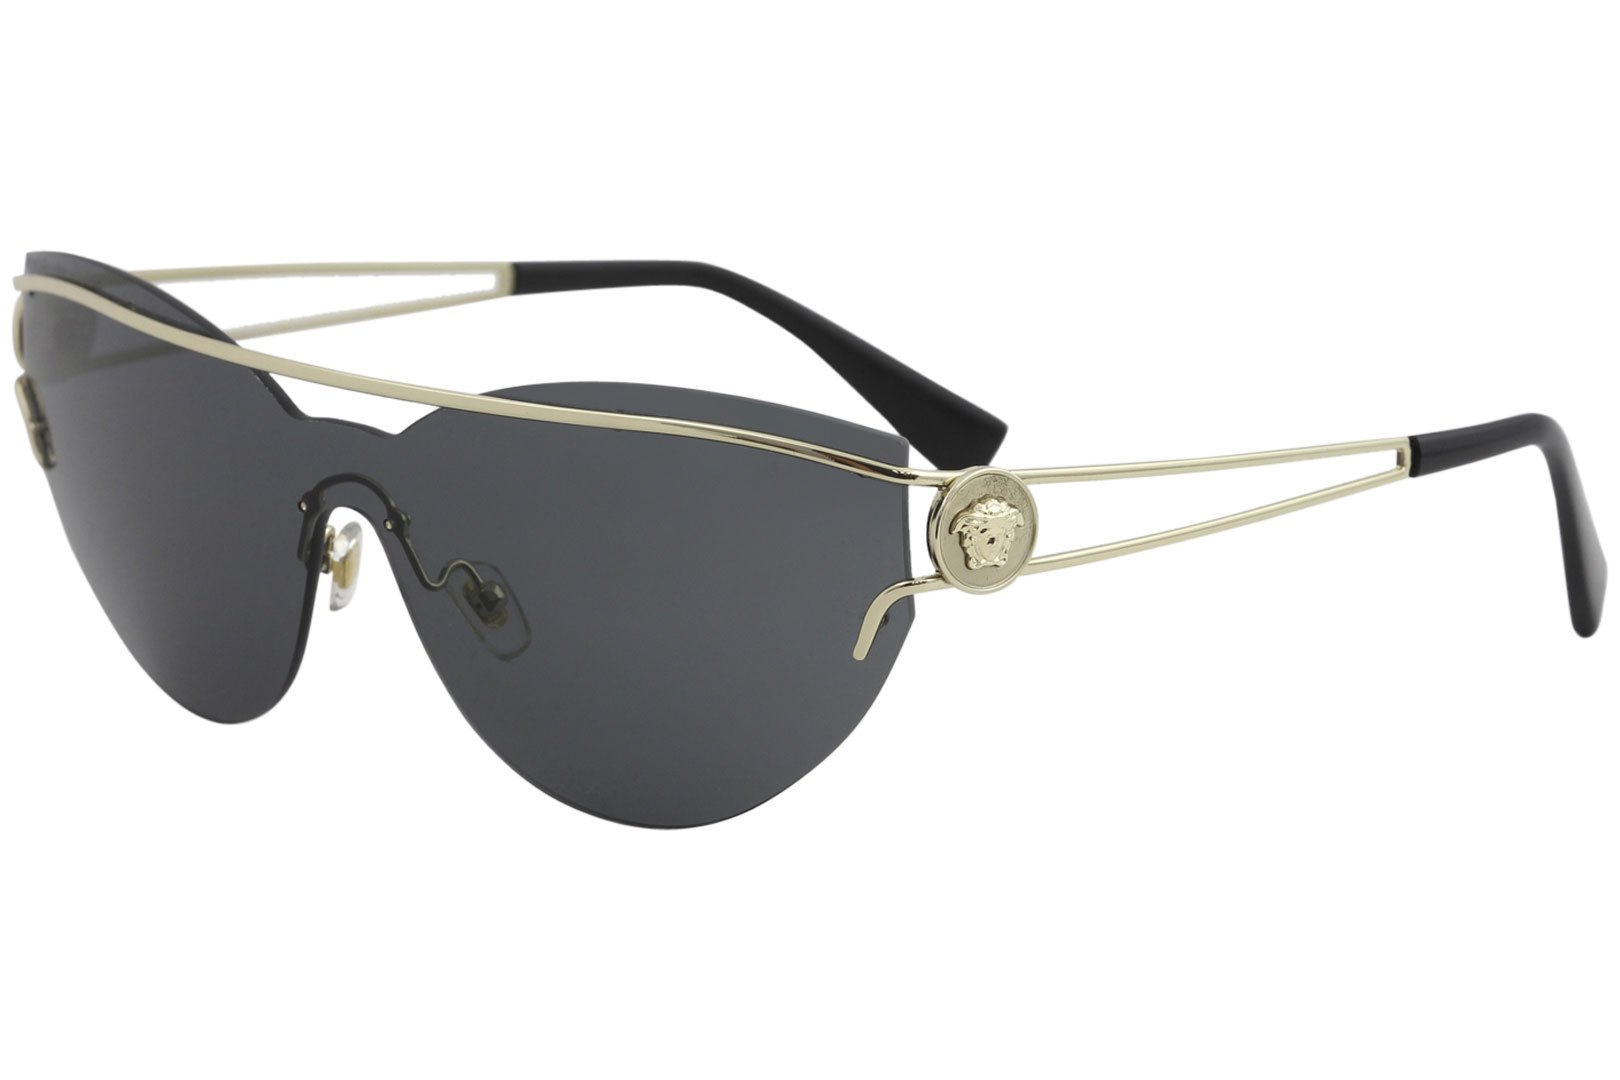 Versace Women's Manifesto Sunglasses, Pale Gold/Grey, One Size